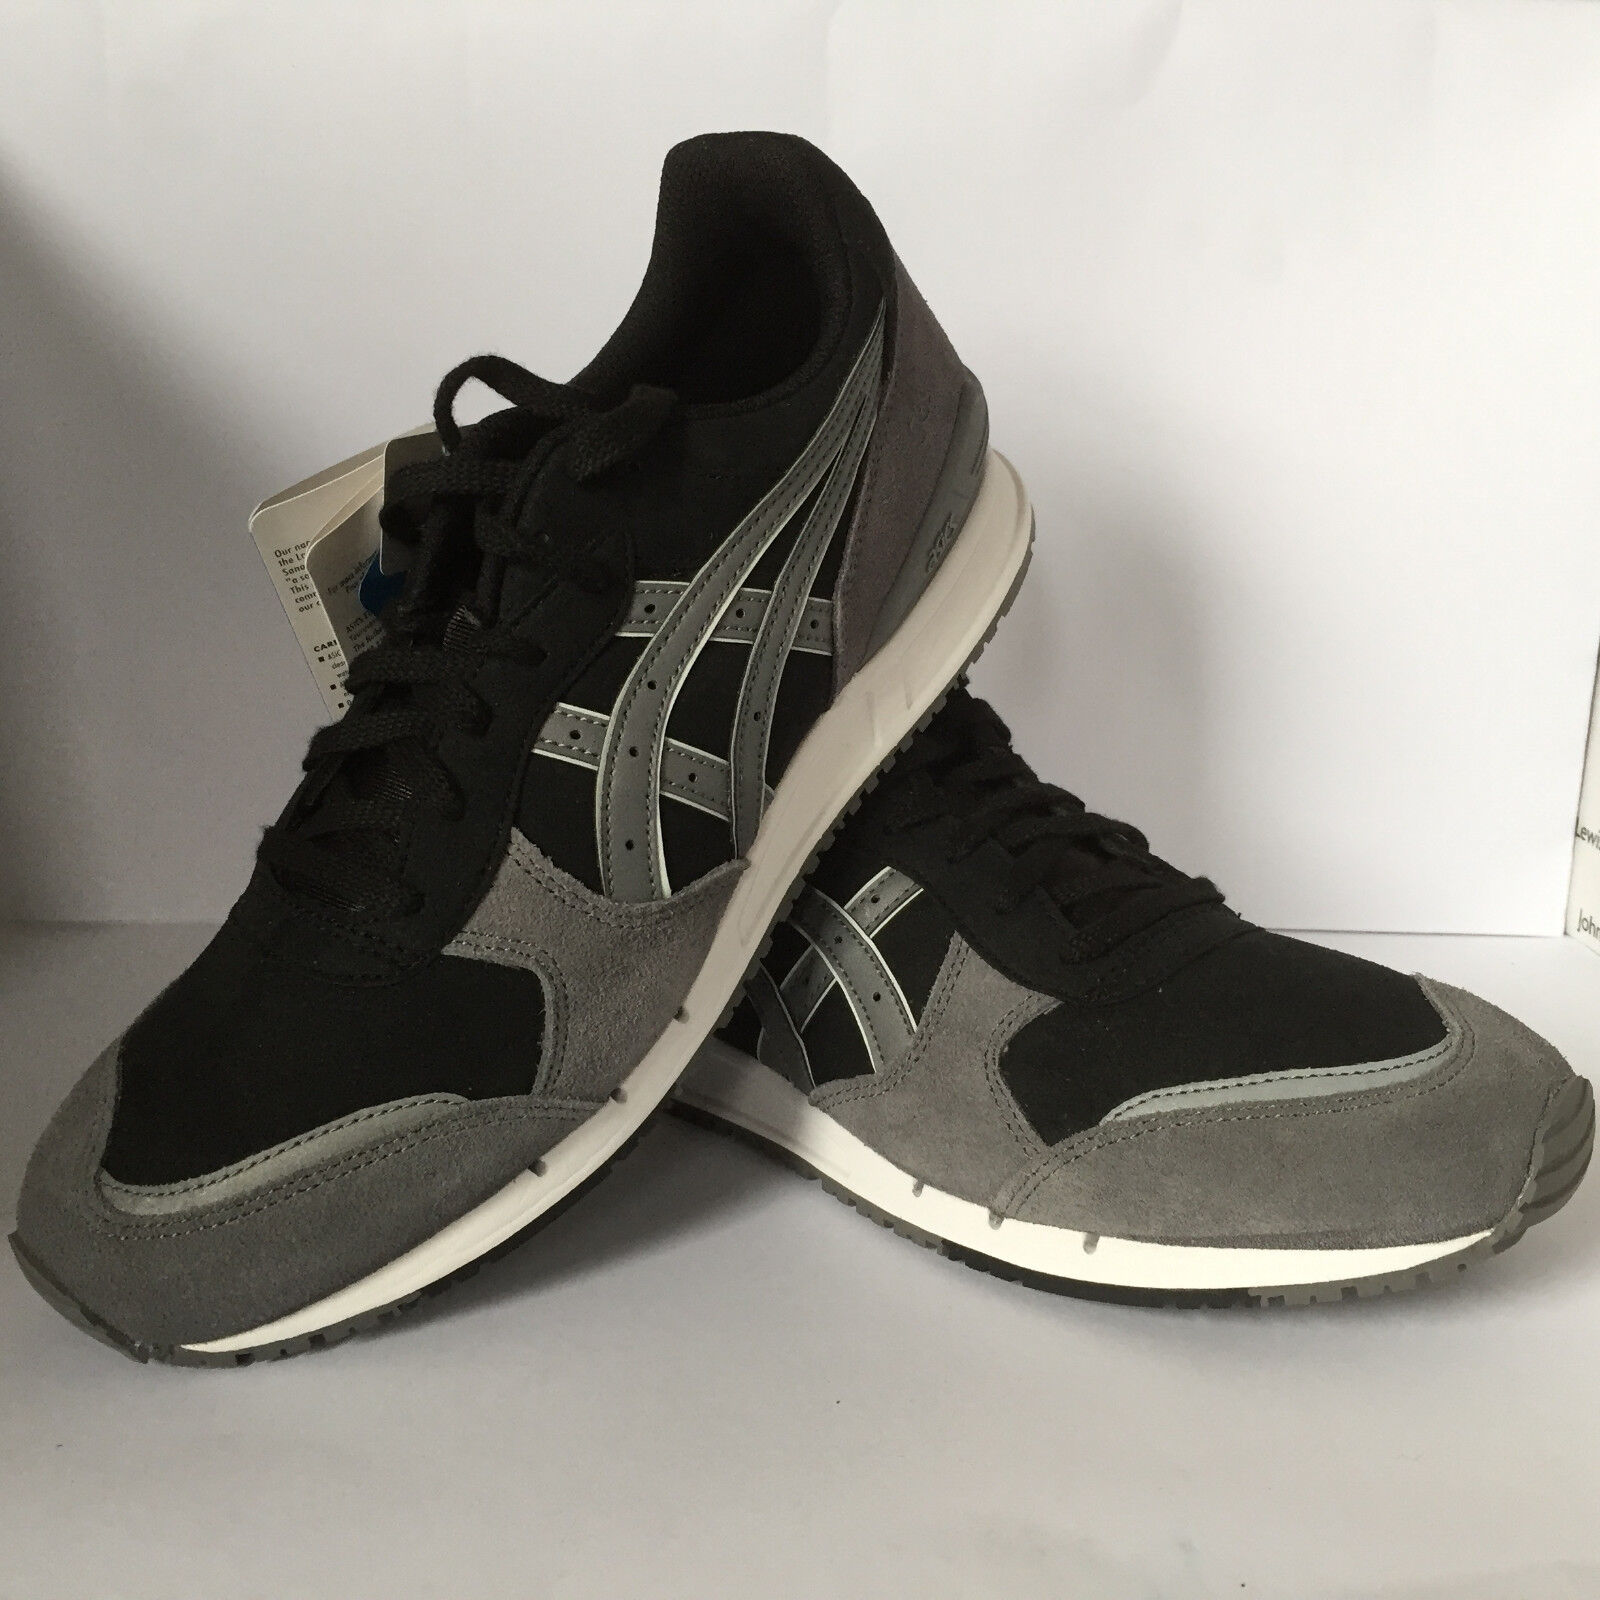 Asics Gel Classic Mens Classic Runner Black Grey New £49.99